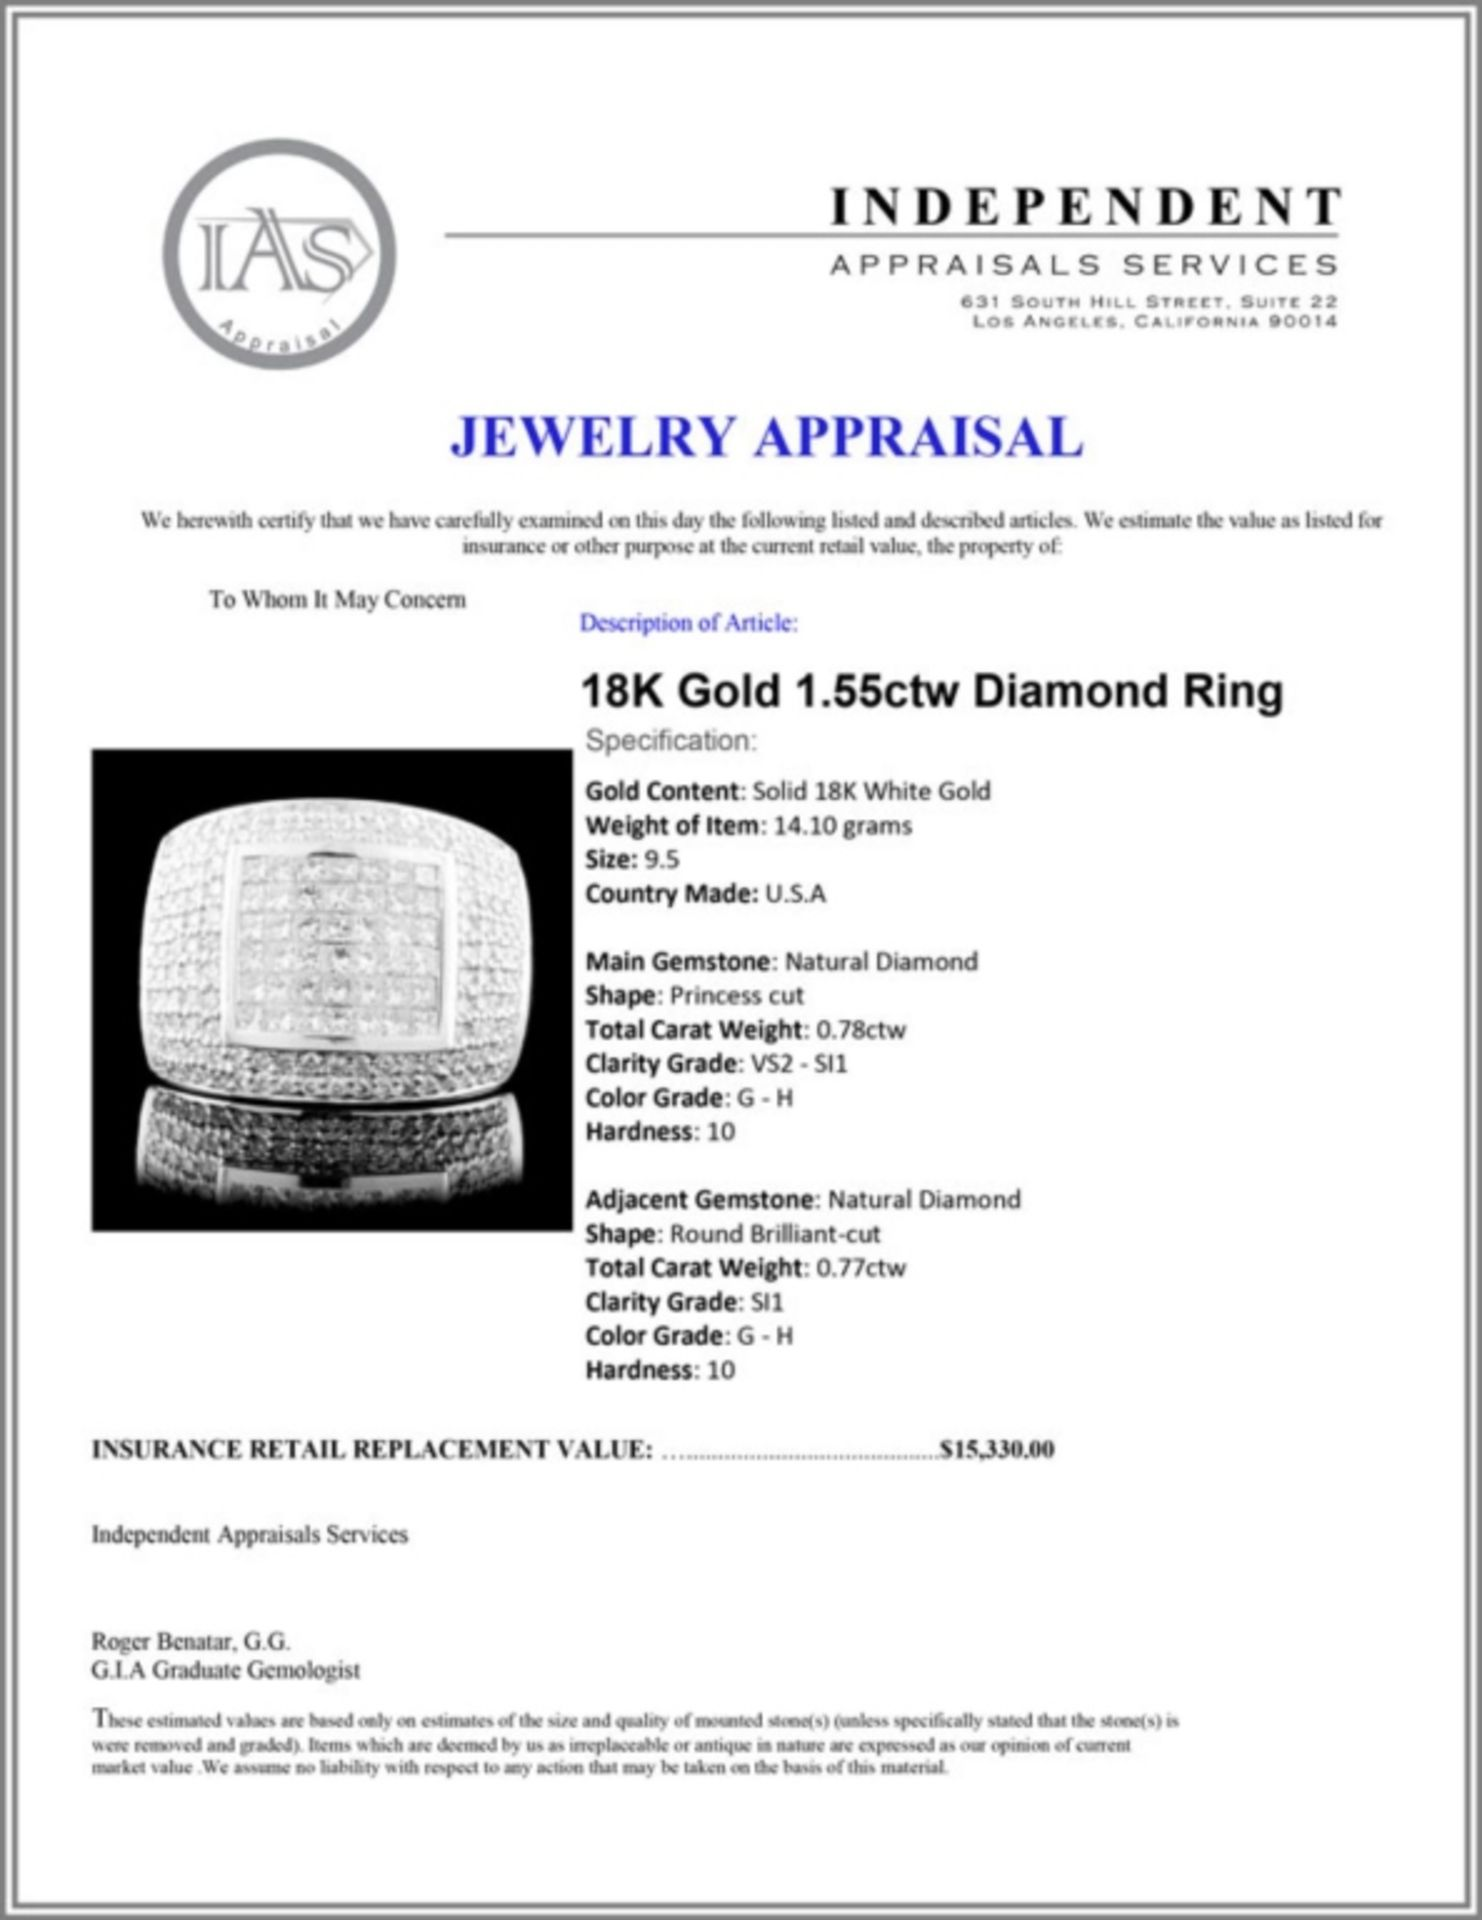 18K Gold 1.55ctw Diamond Ring - Image 4 of 4